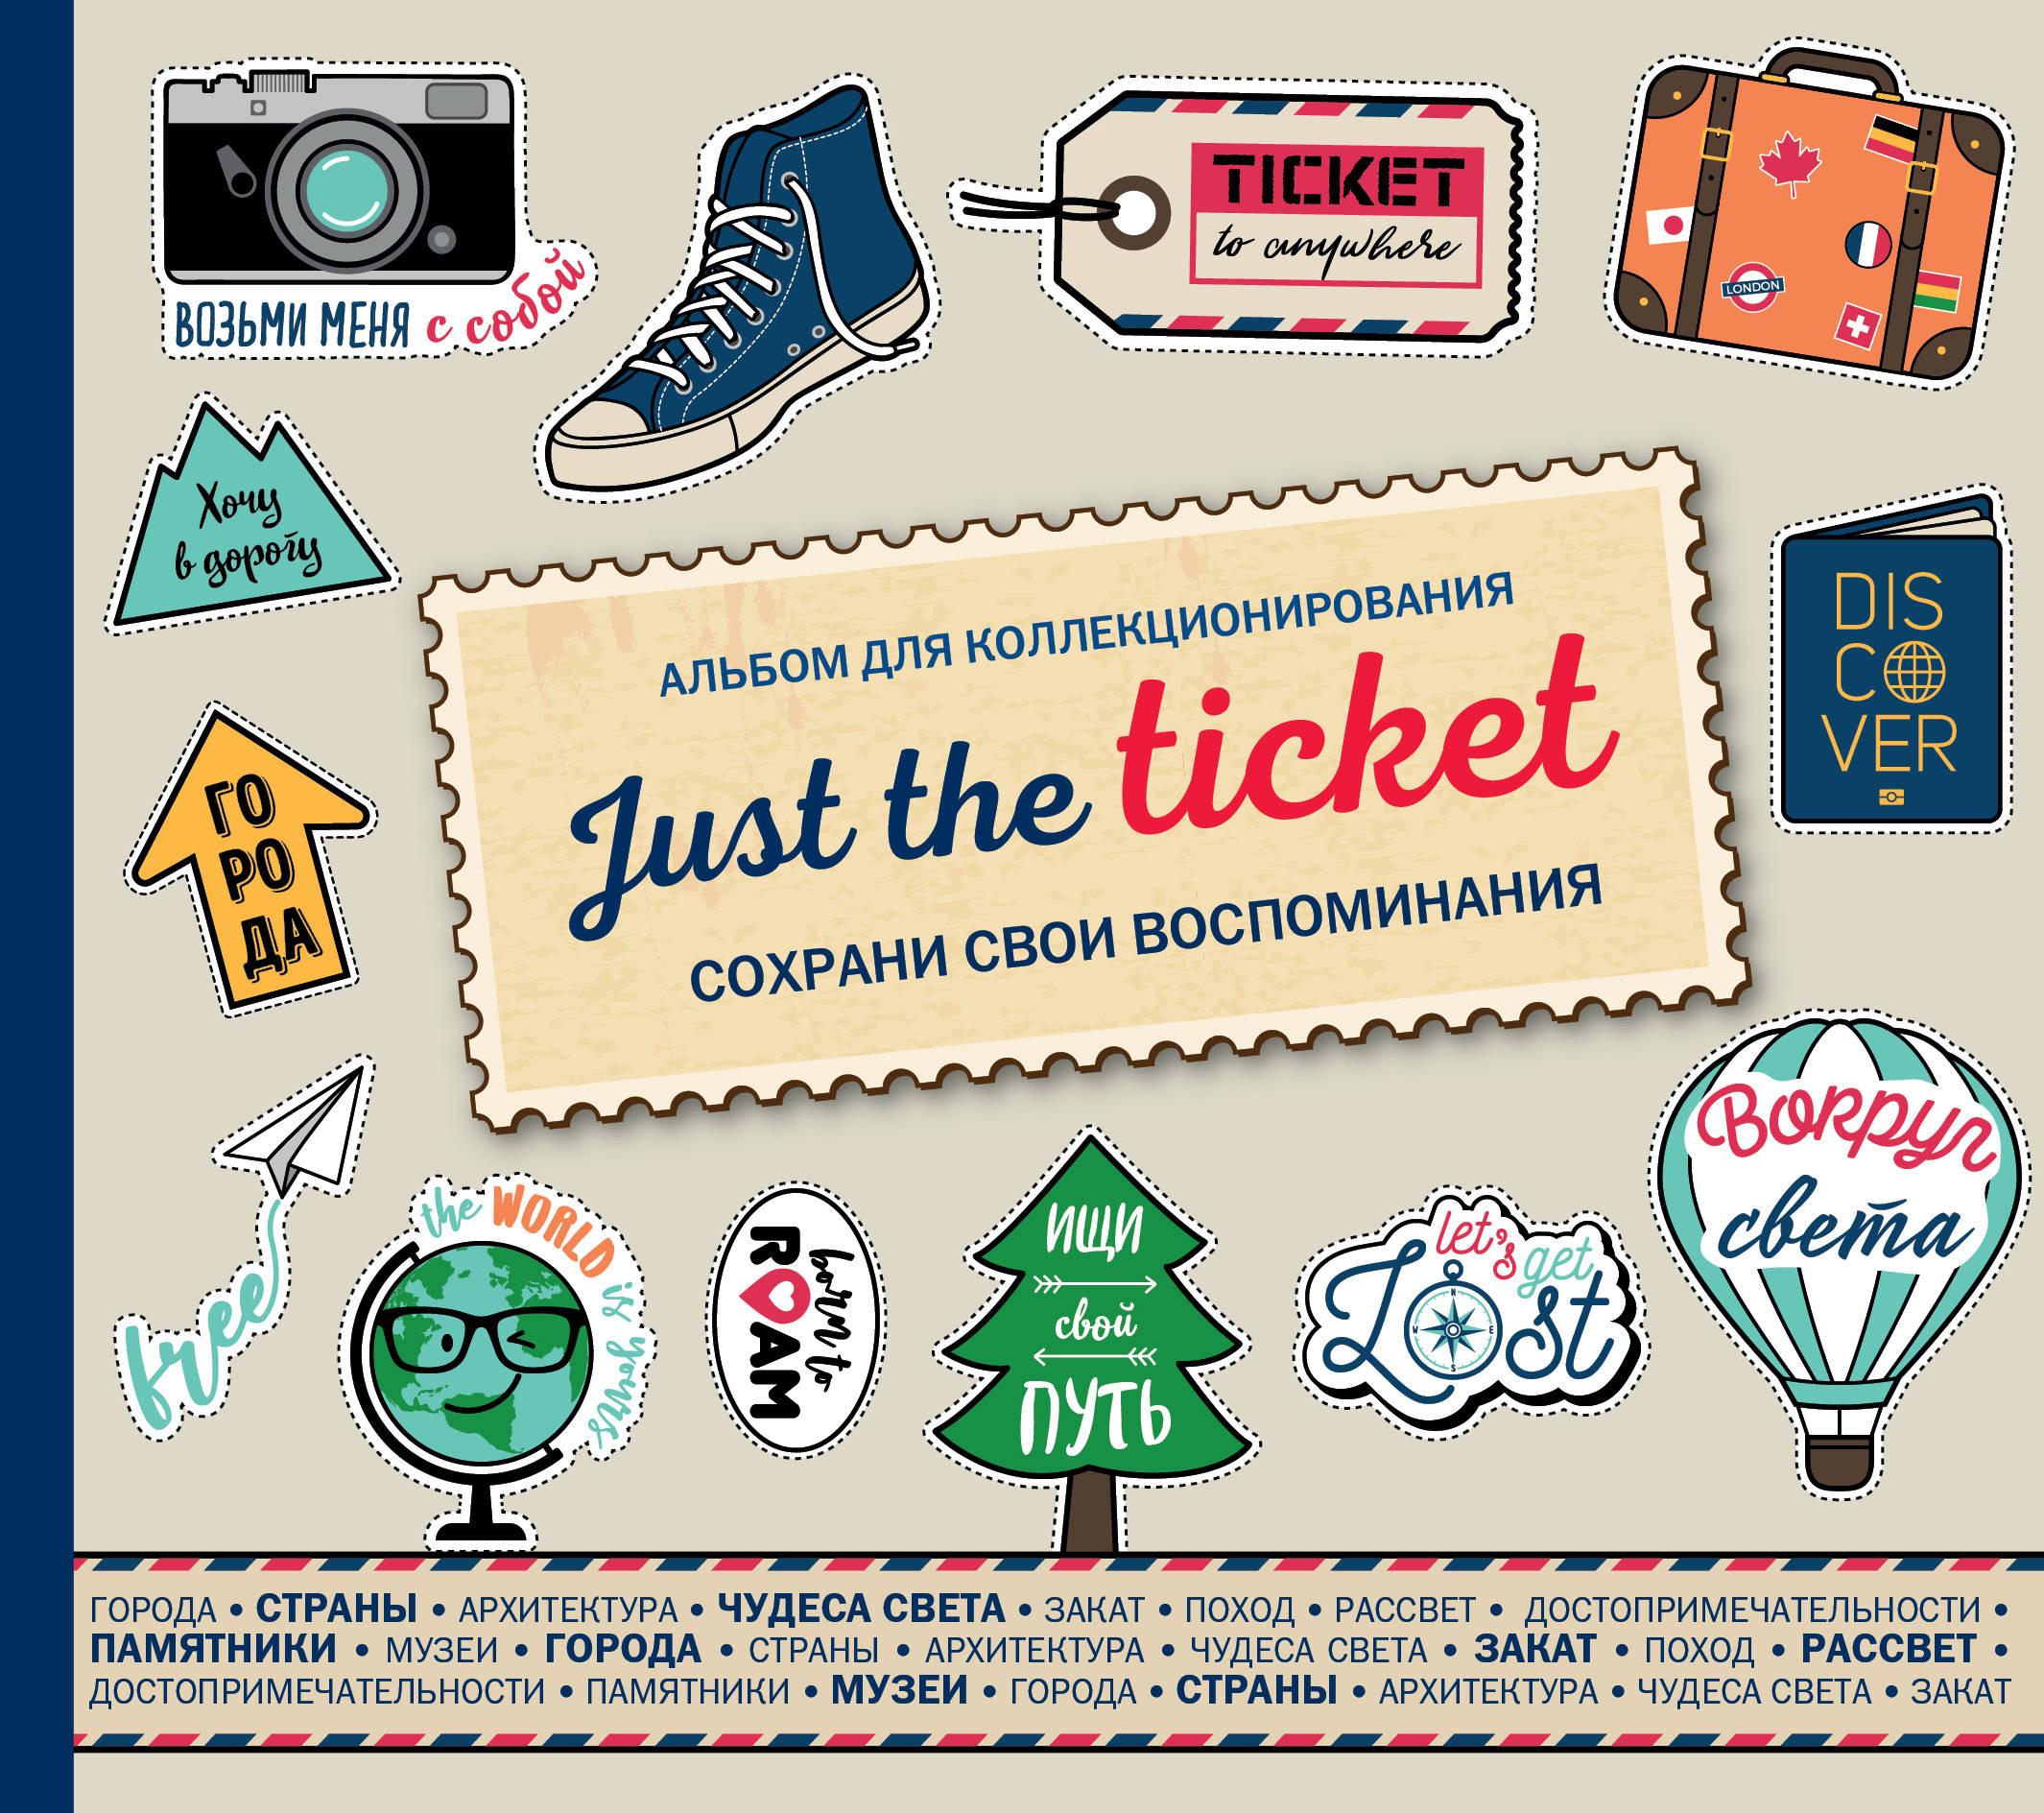 Just the ticket. Albom dlja kollektsionirovanija (puteshestvija)